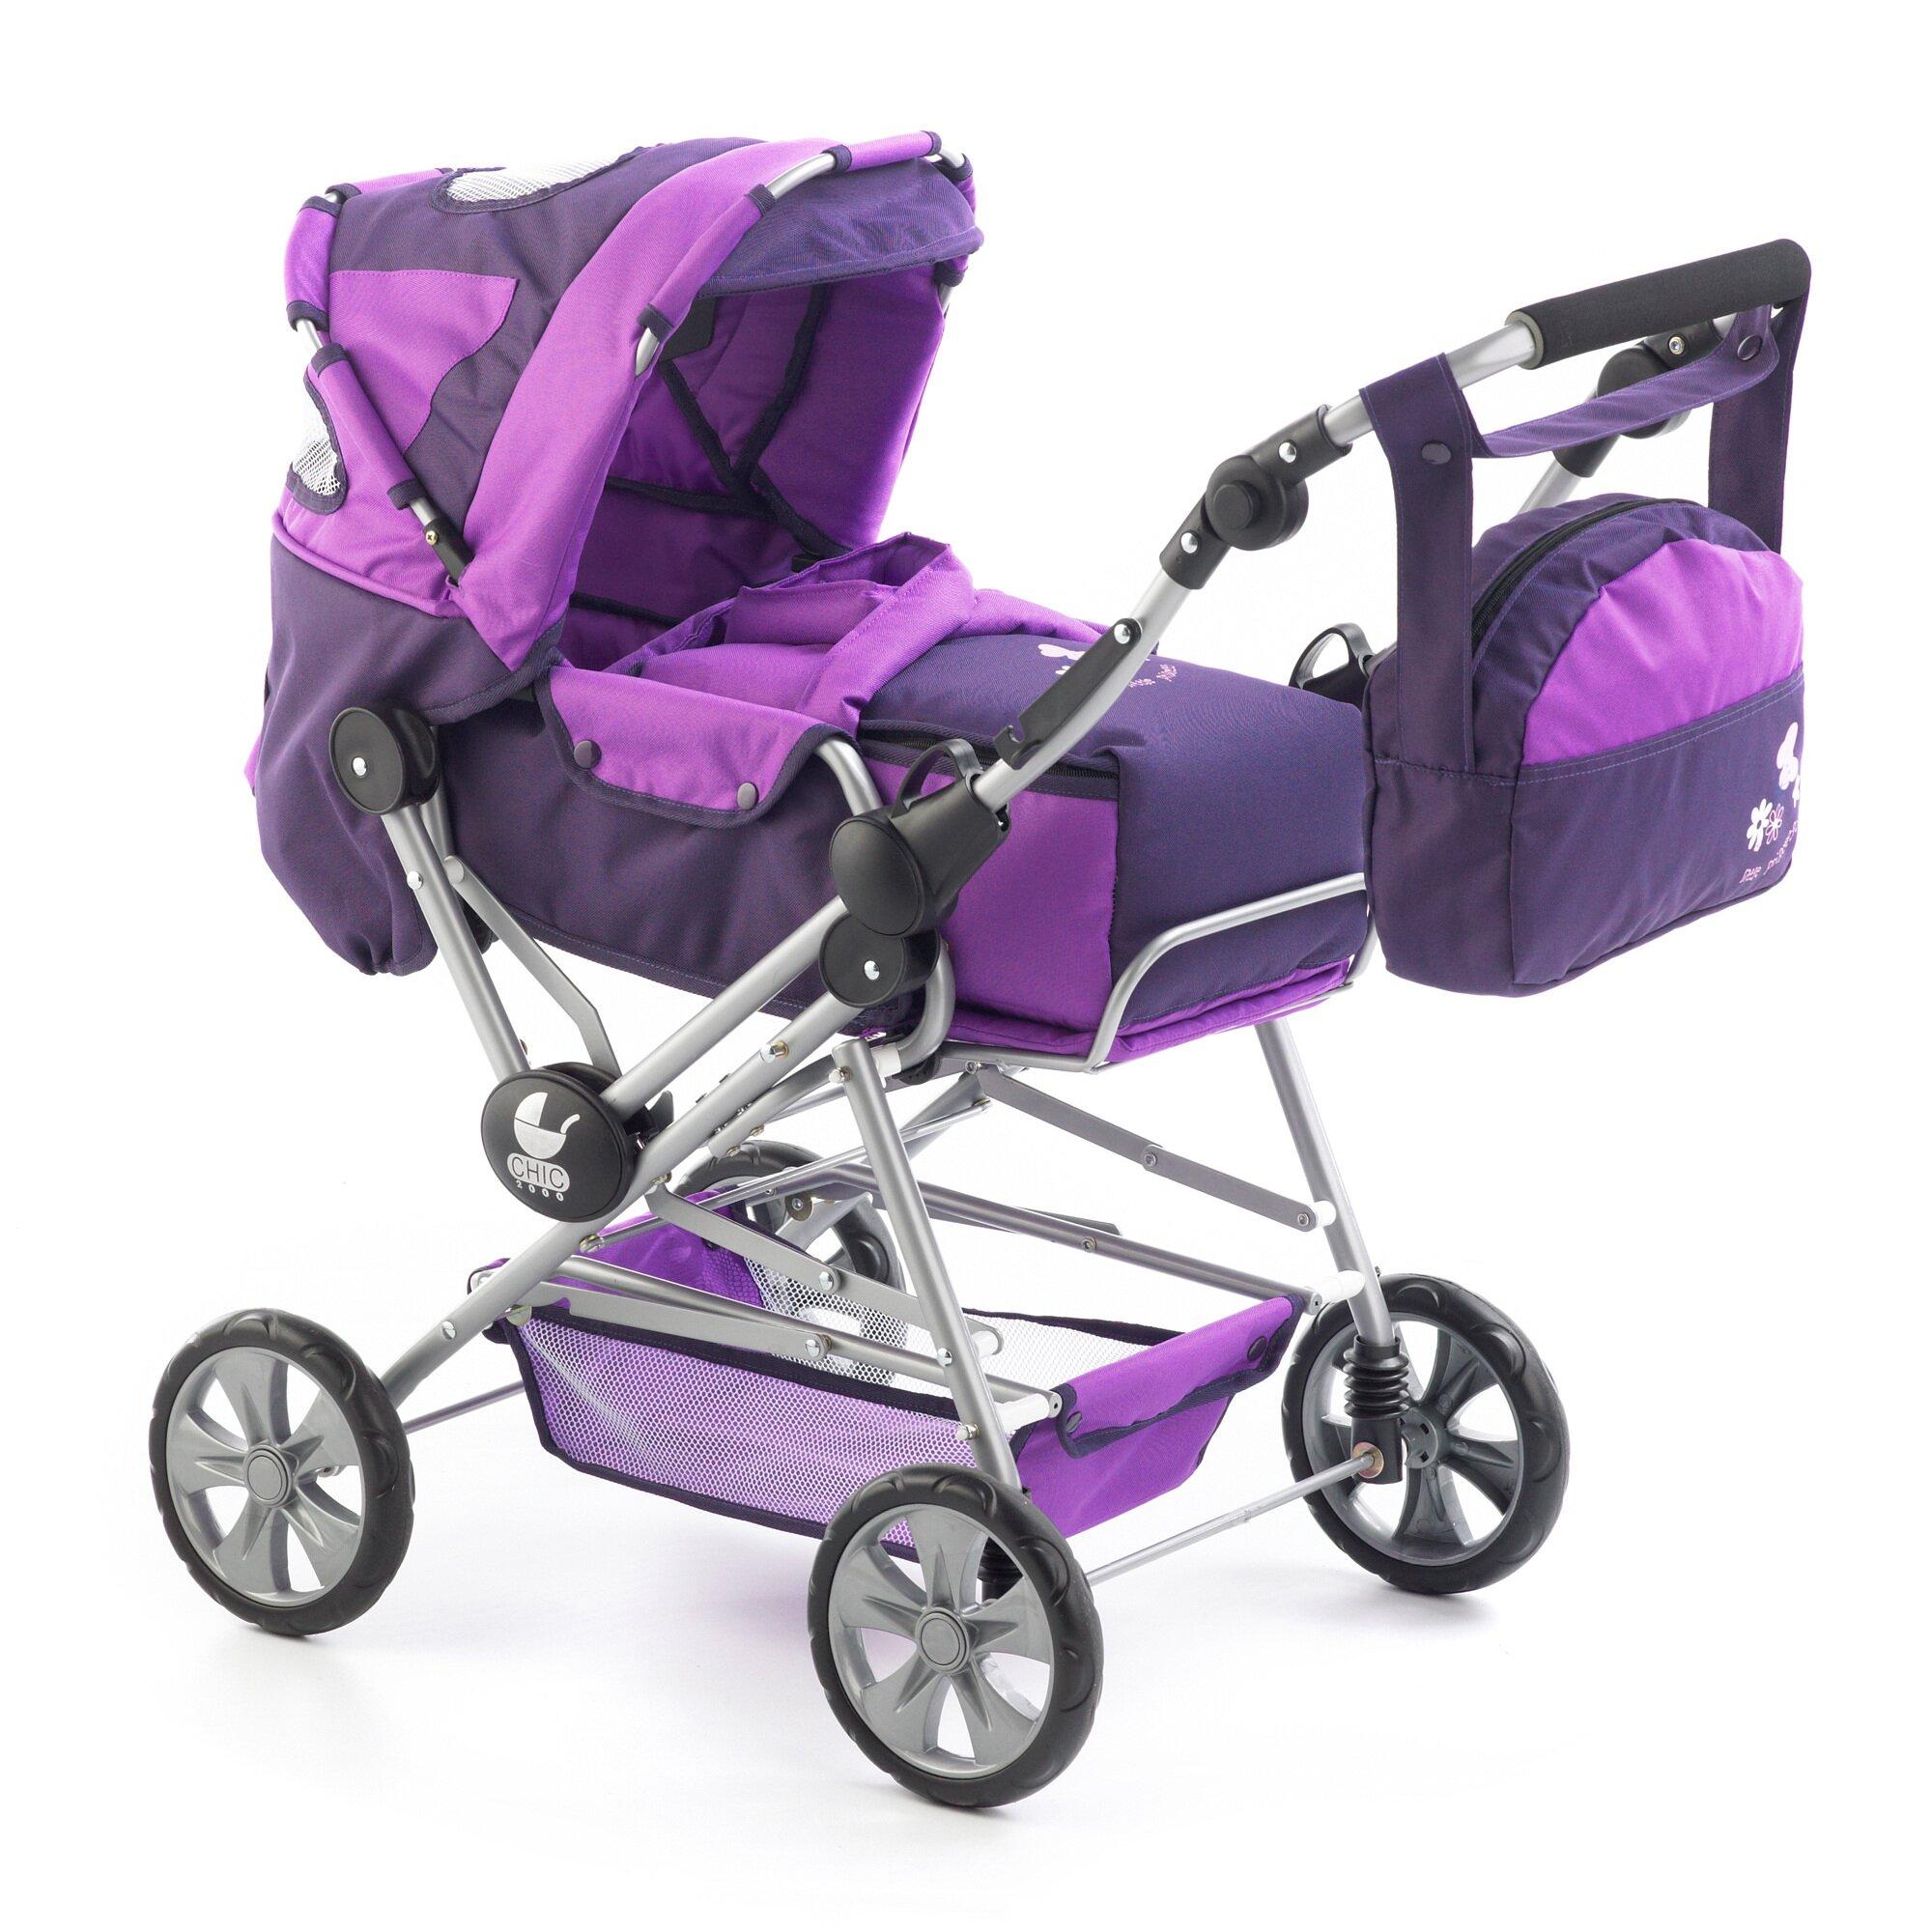 Bayer Chic Kombi-Puppenwagen Roadstar